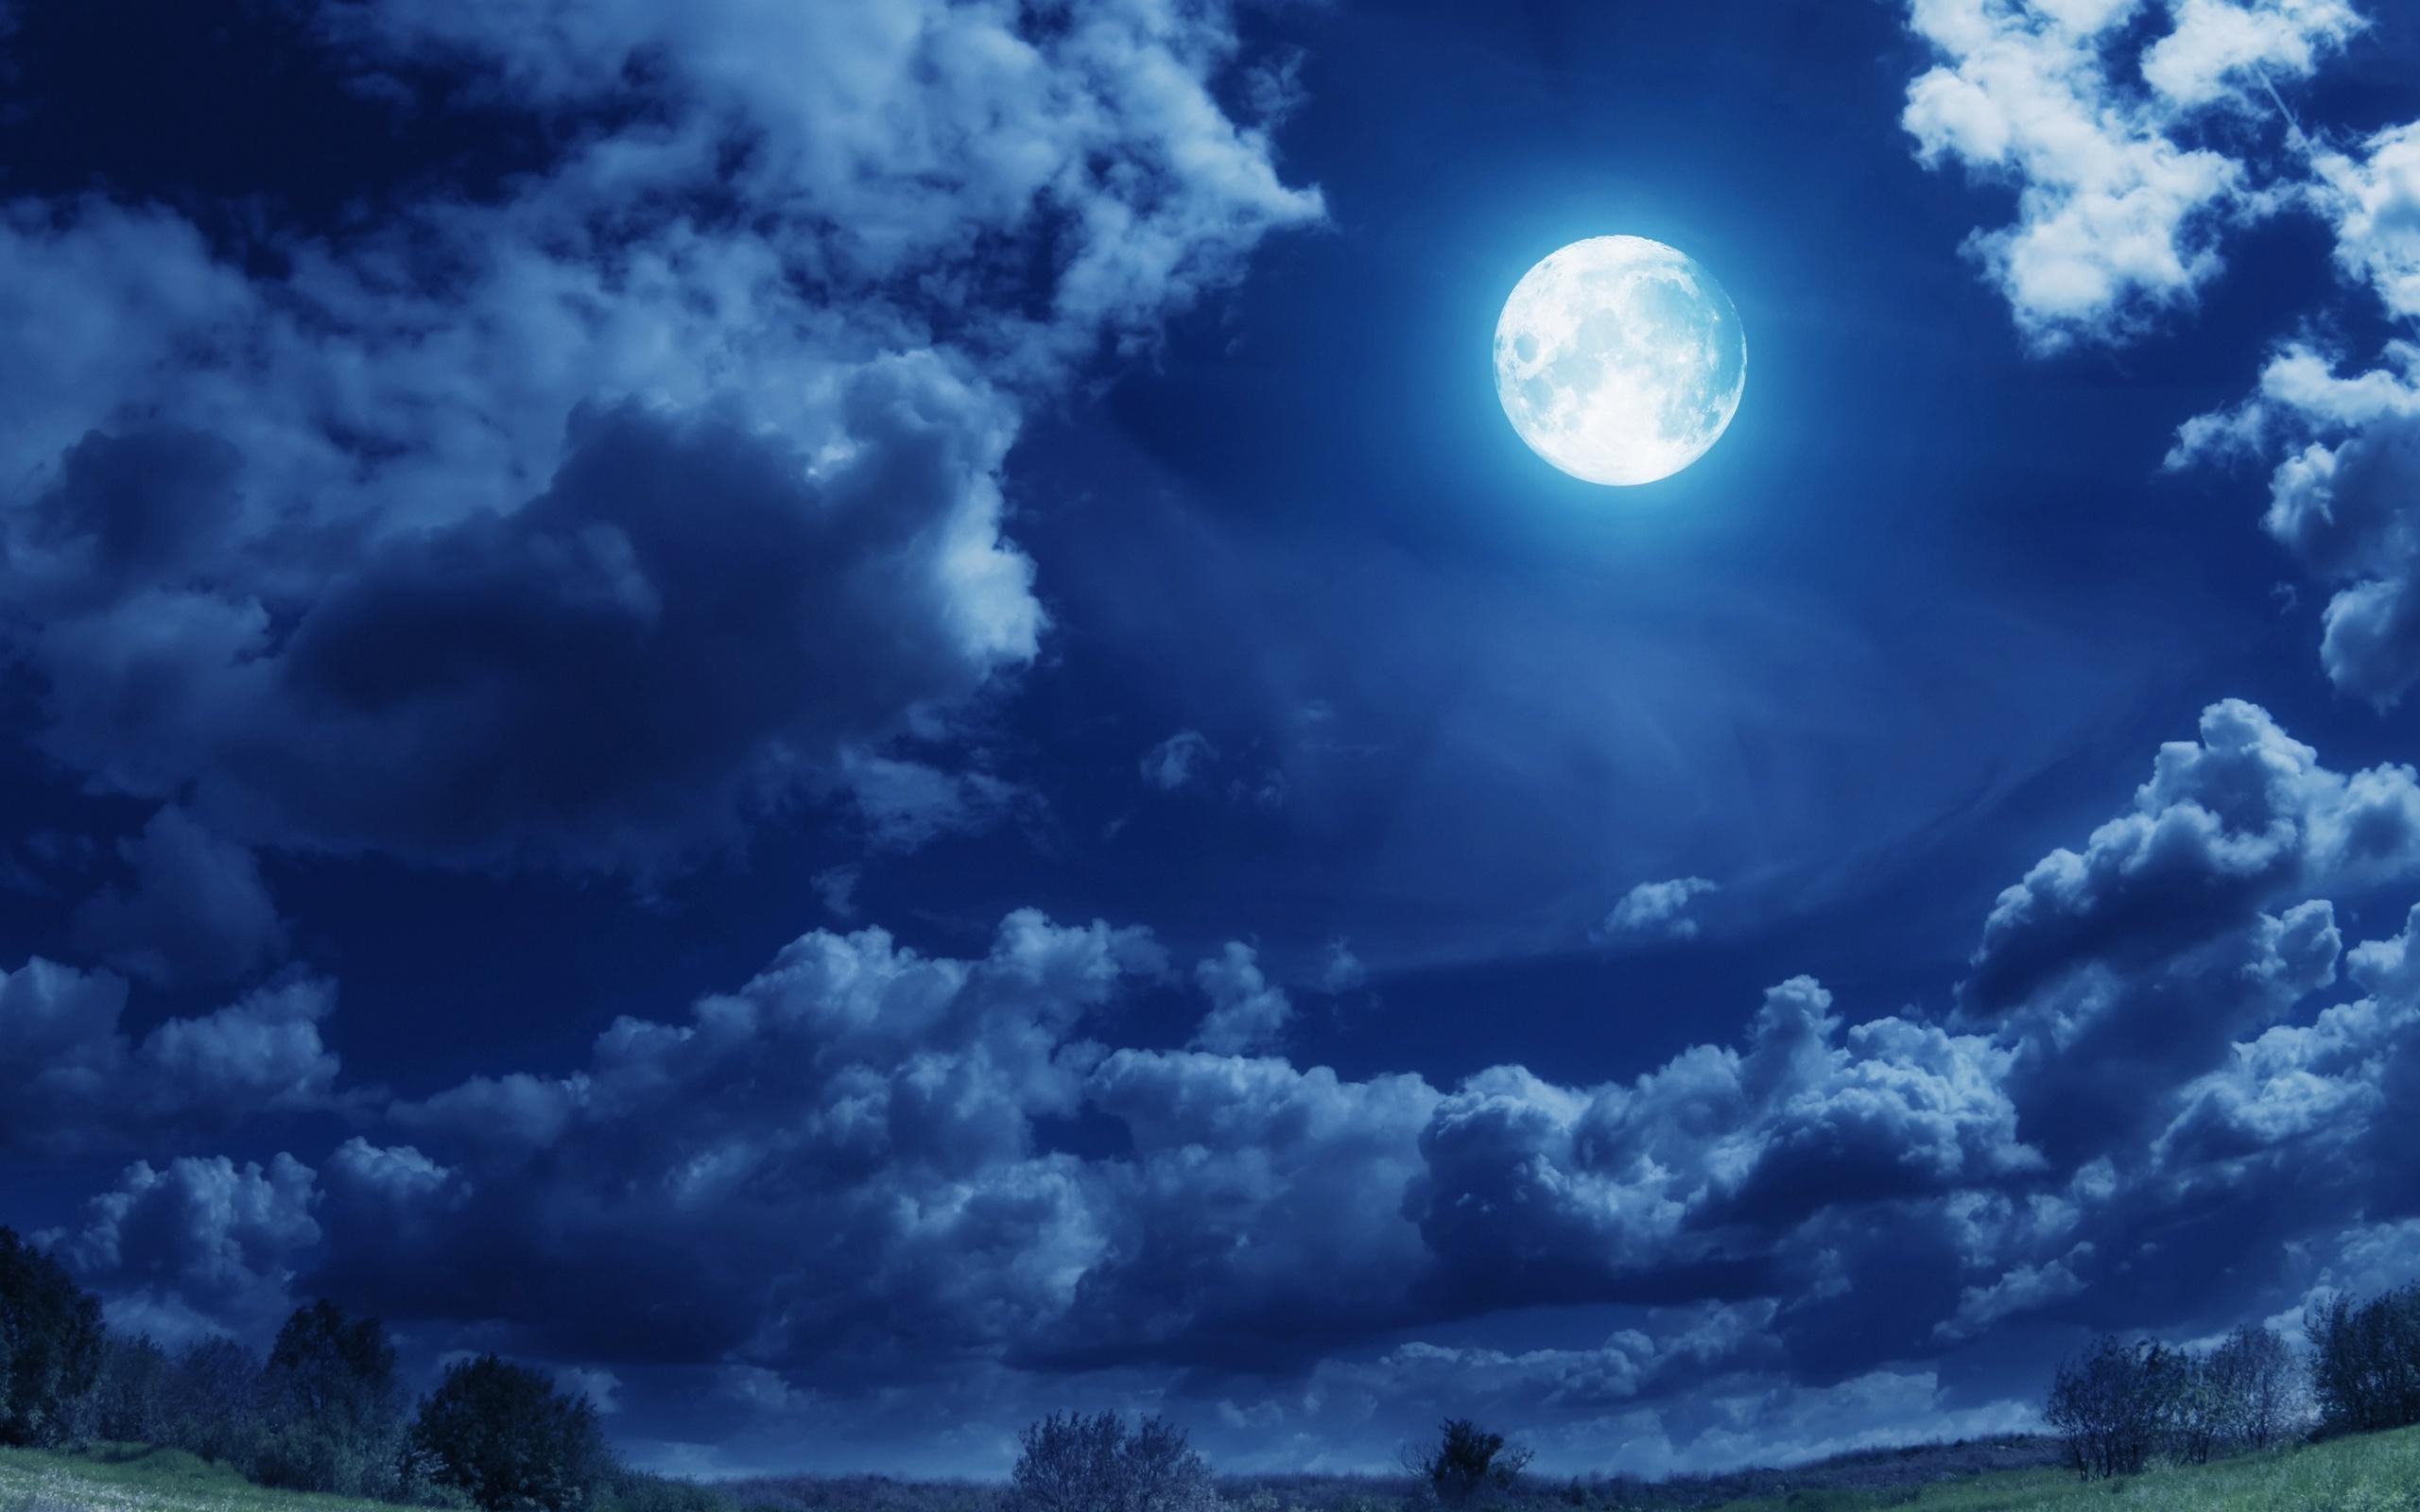 Wallpaper night sky full moon clouds moon desktop wallpaper 2560x1600